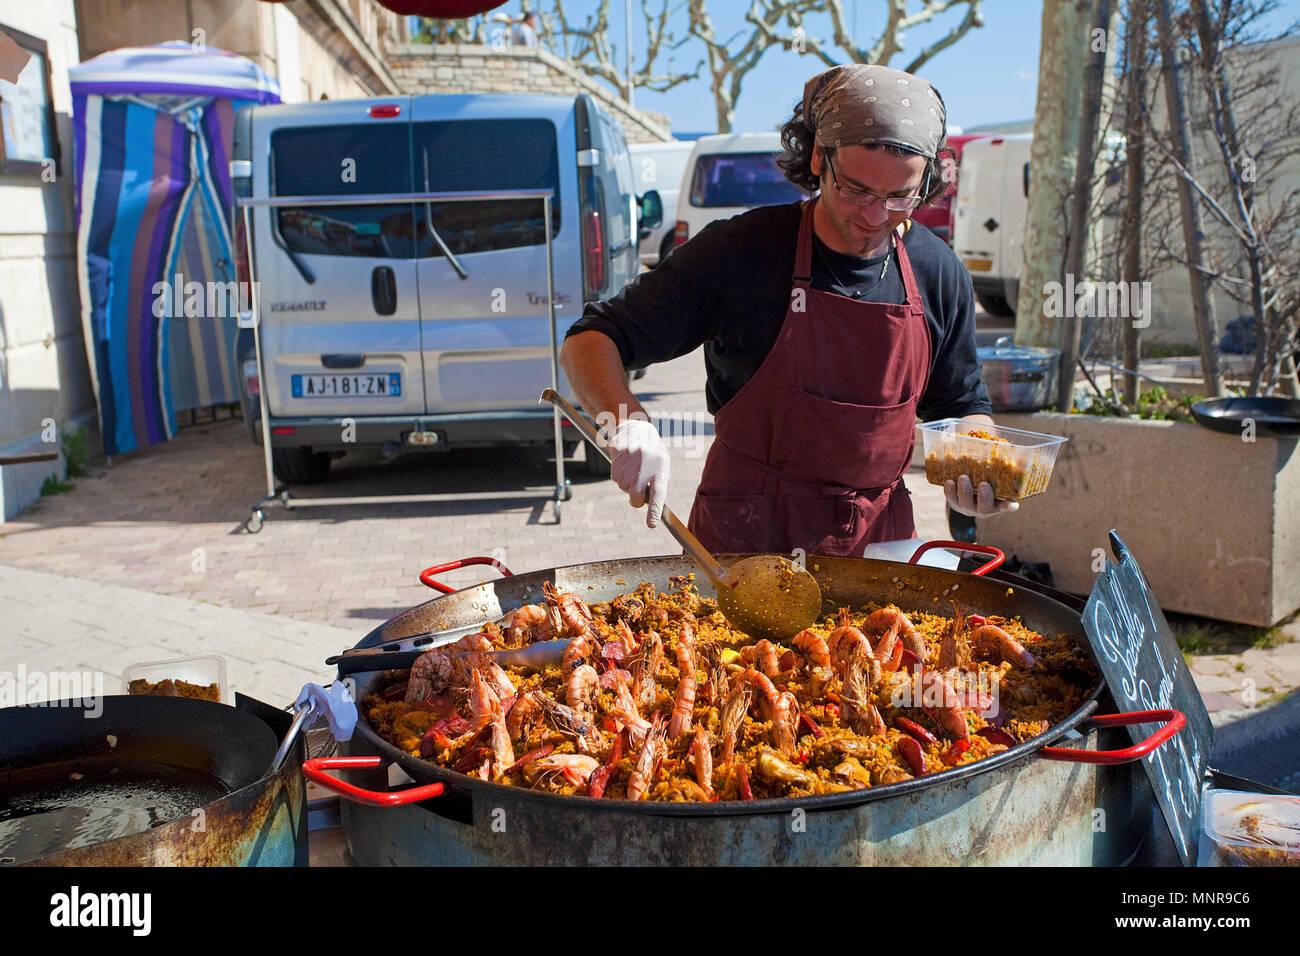 Street market, man sells Paella with prawns, La Ciotat, Bouches-du-Rhone, Provence-Alpes-Côte d'Azur, South France, France, Europe Stock Photo